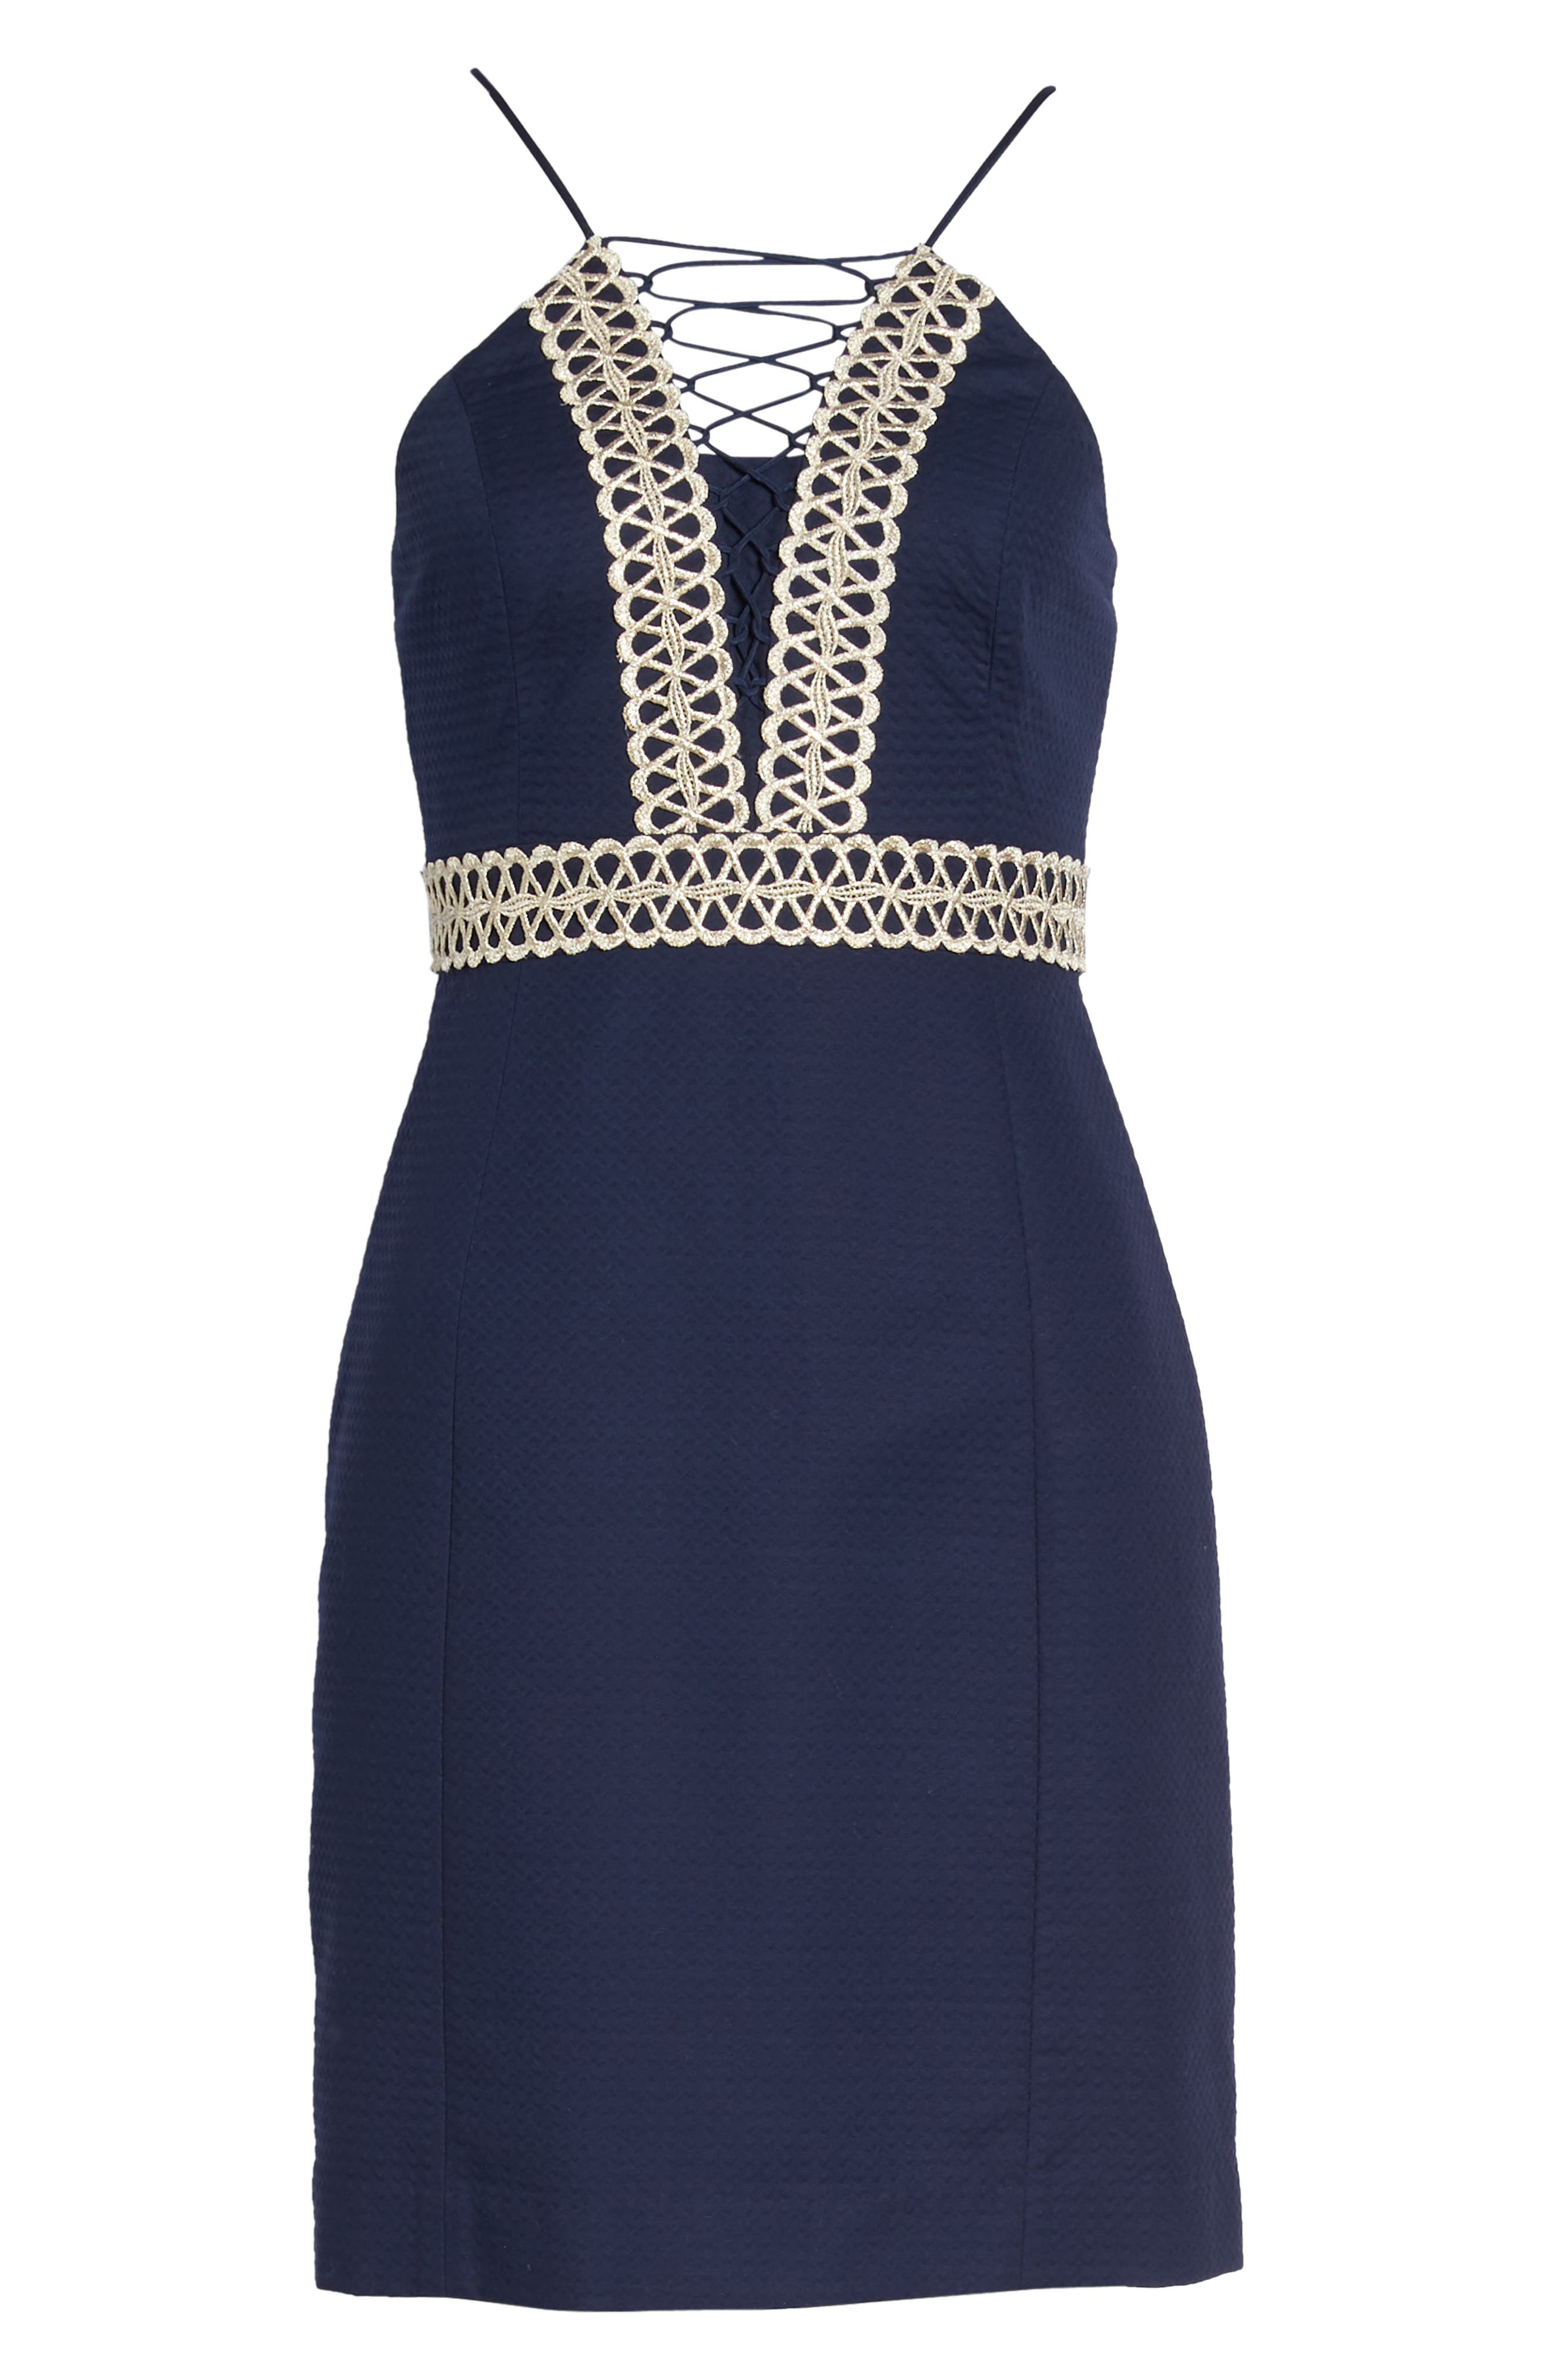 Trista Halter Sheath Dress,                             Alternate thumbnail 7, color,                             408